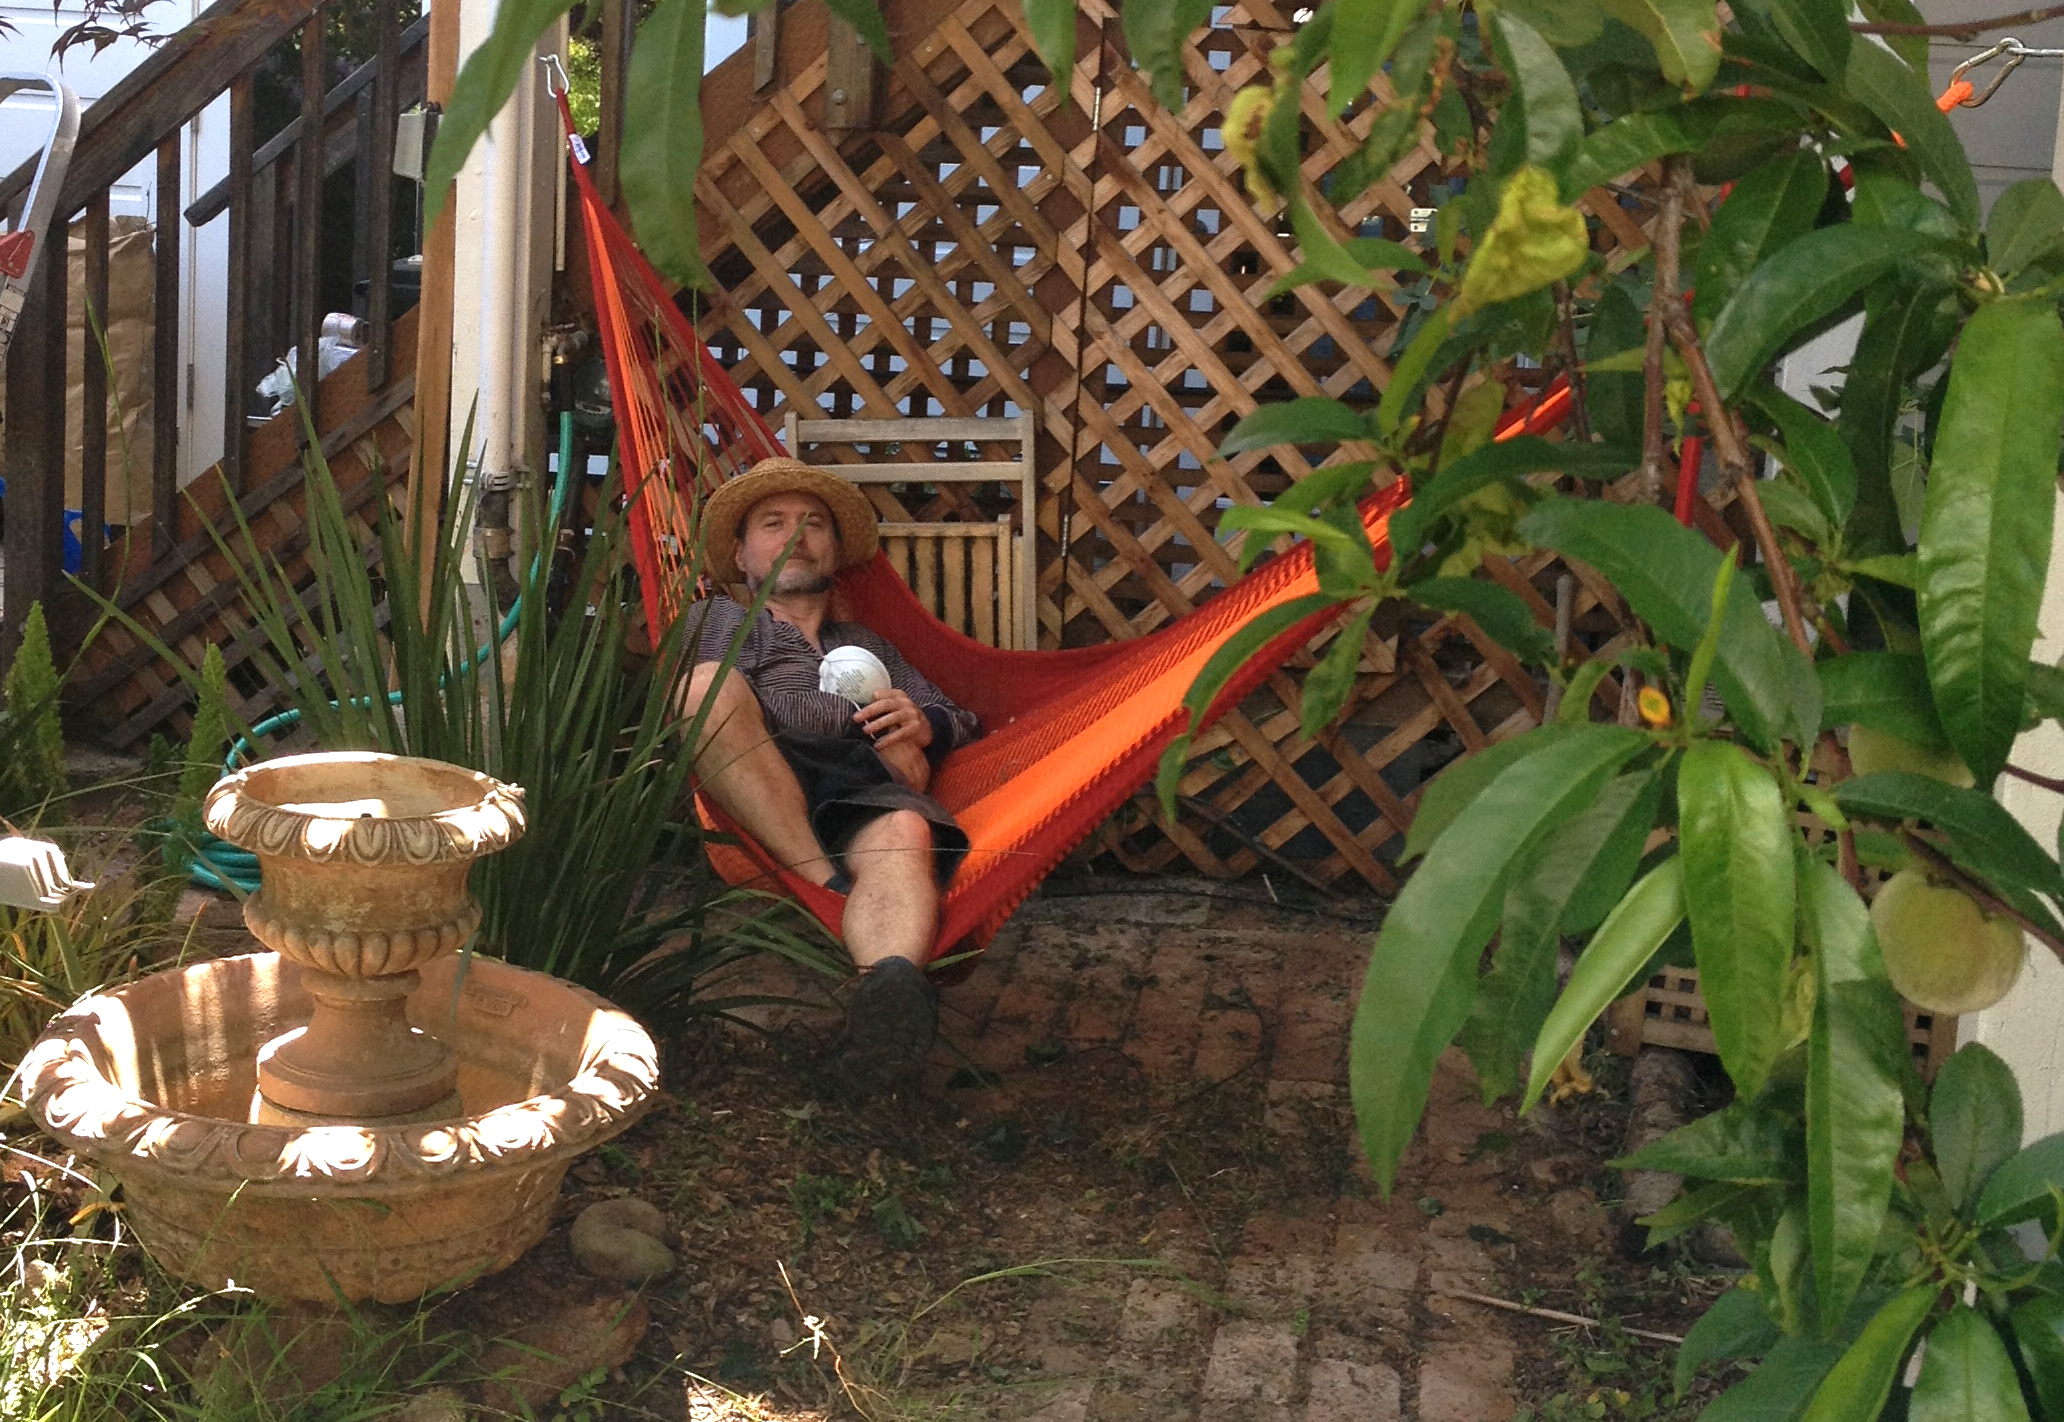 david-delp-hammock